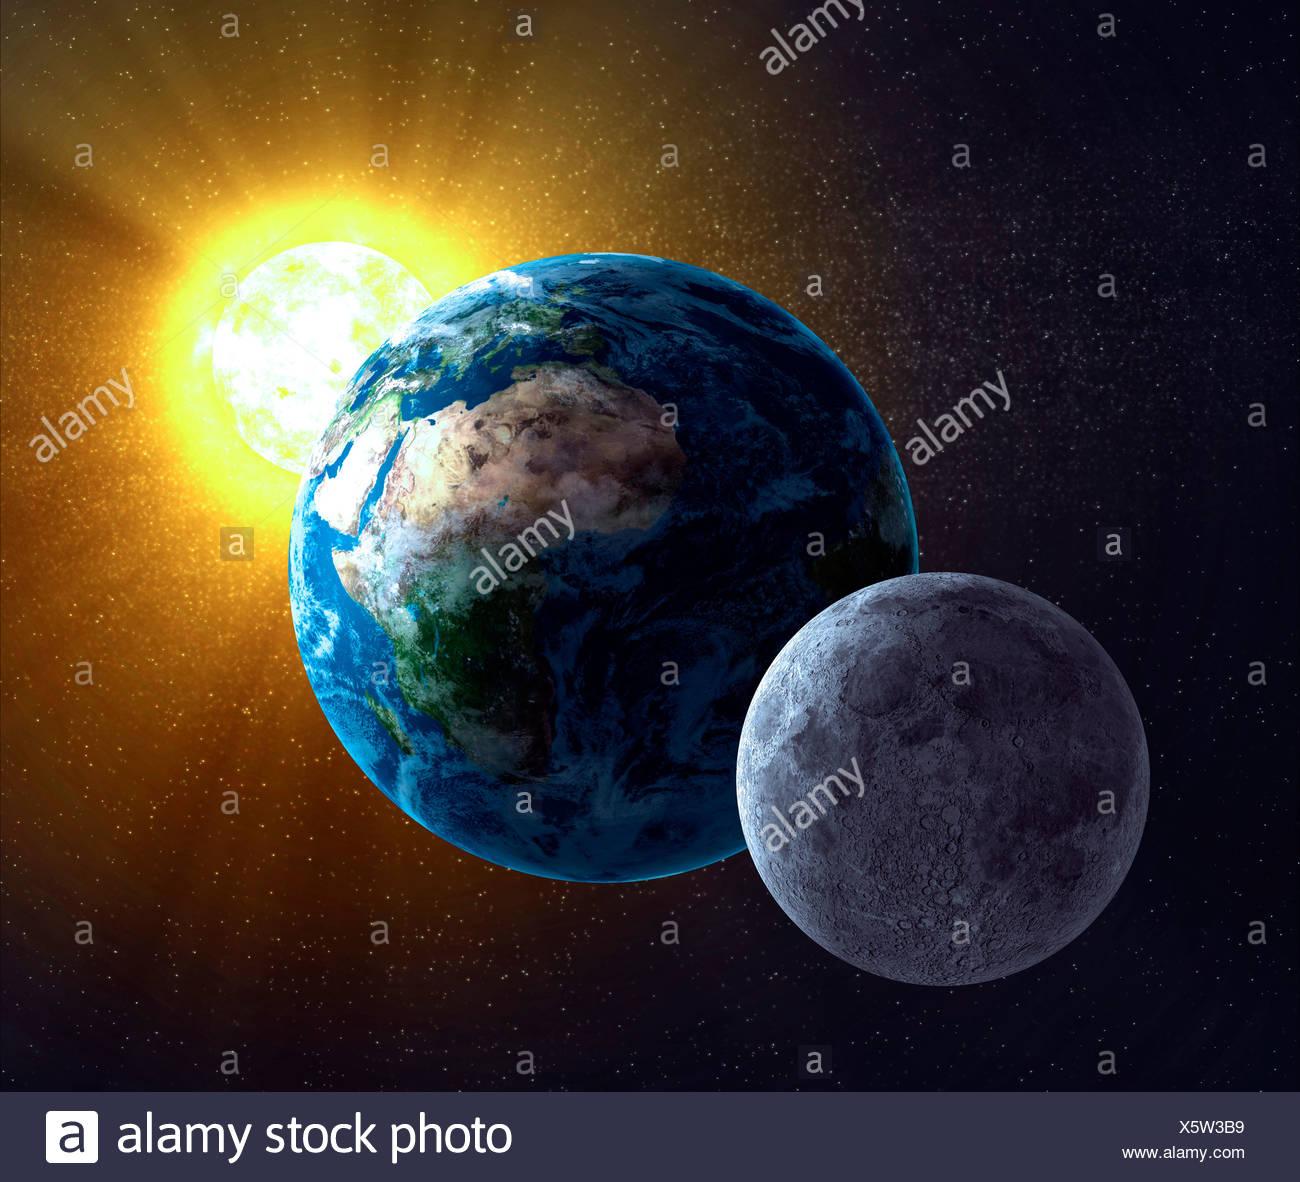 Earth Moon And Sun Artwork Stock Photo